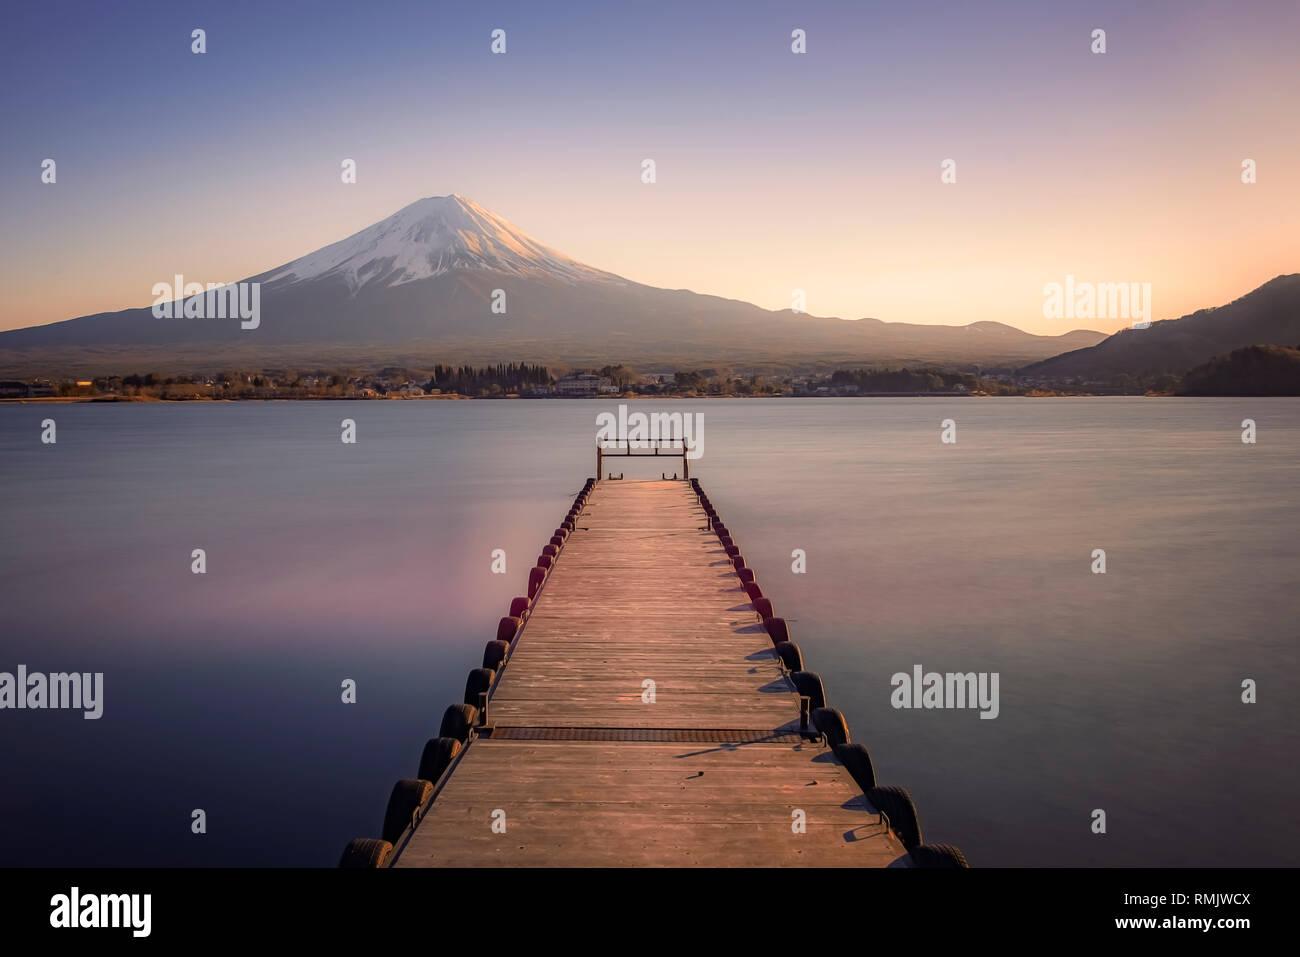 Mount Fuji in Kawaguchiko, Japan Stock Photo